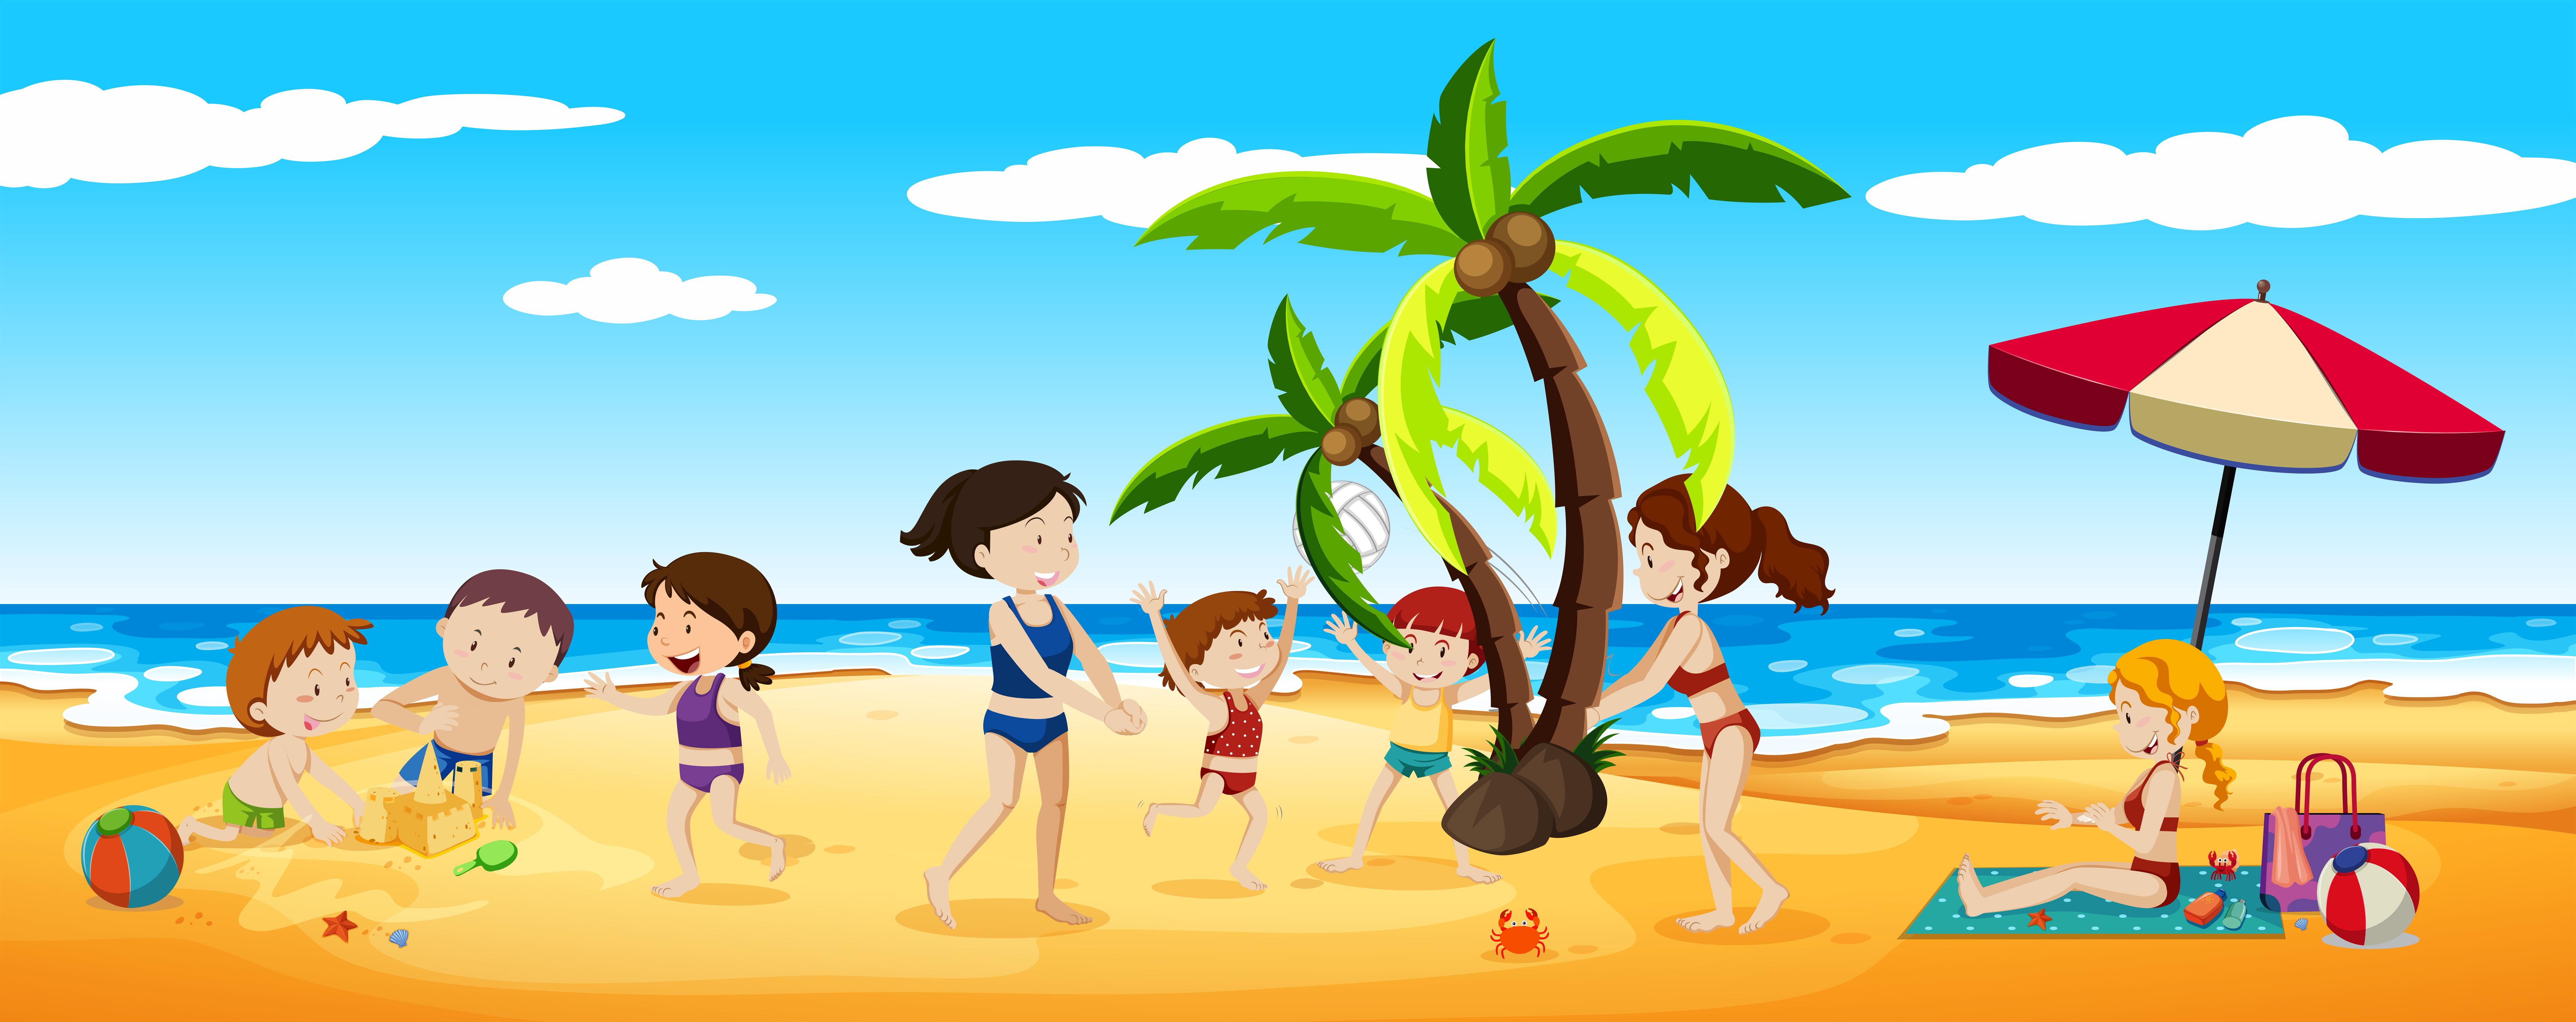 Scene of people having fun at the beach - Download Free ...